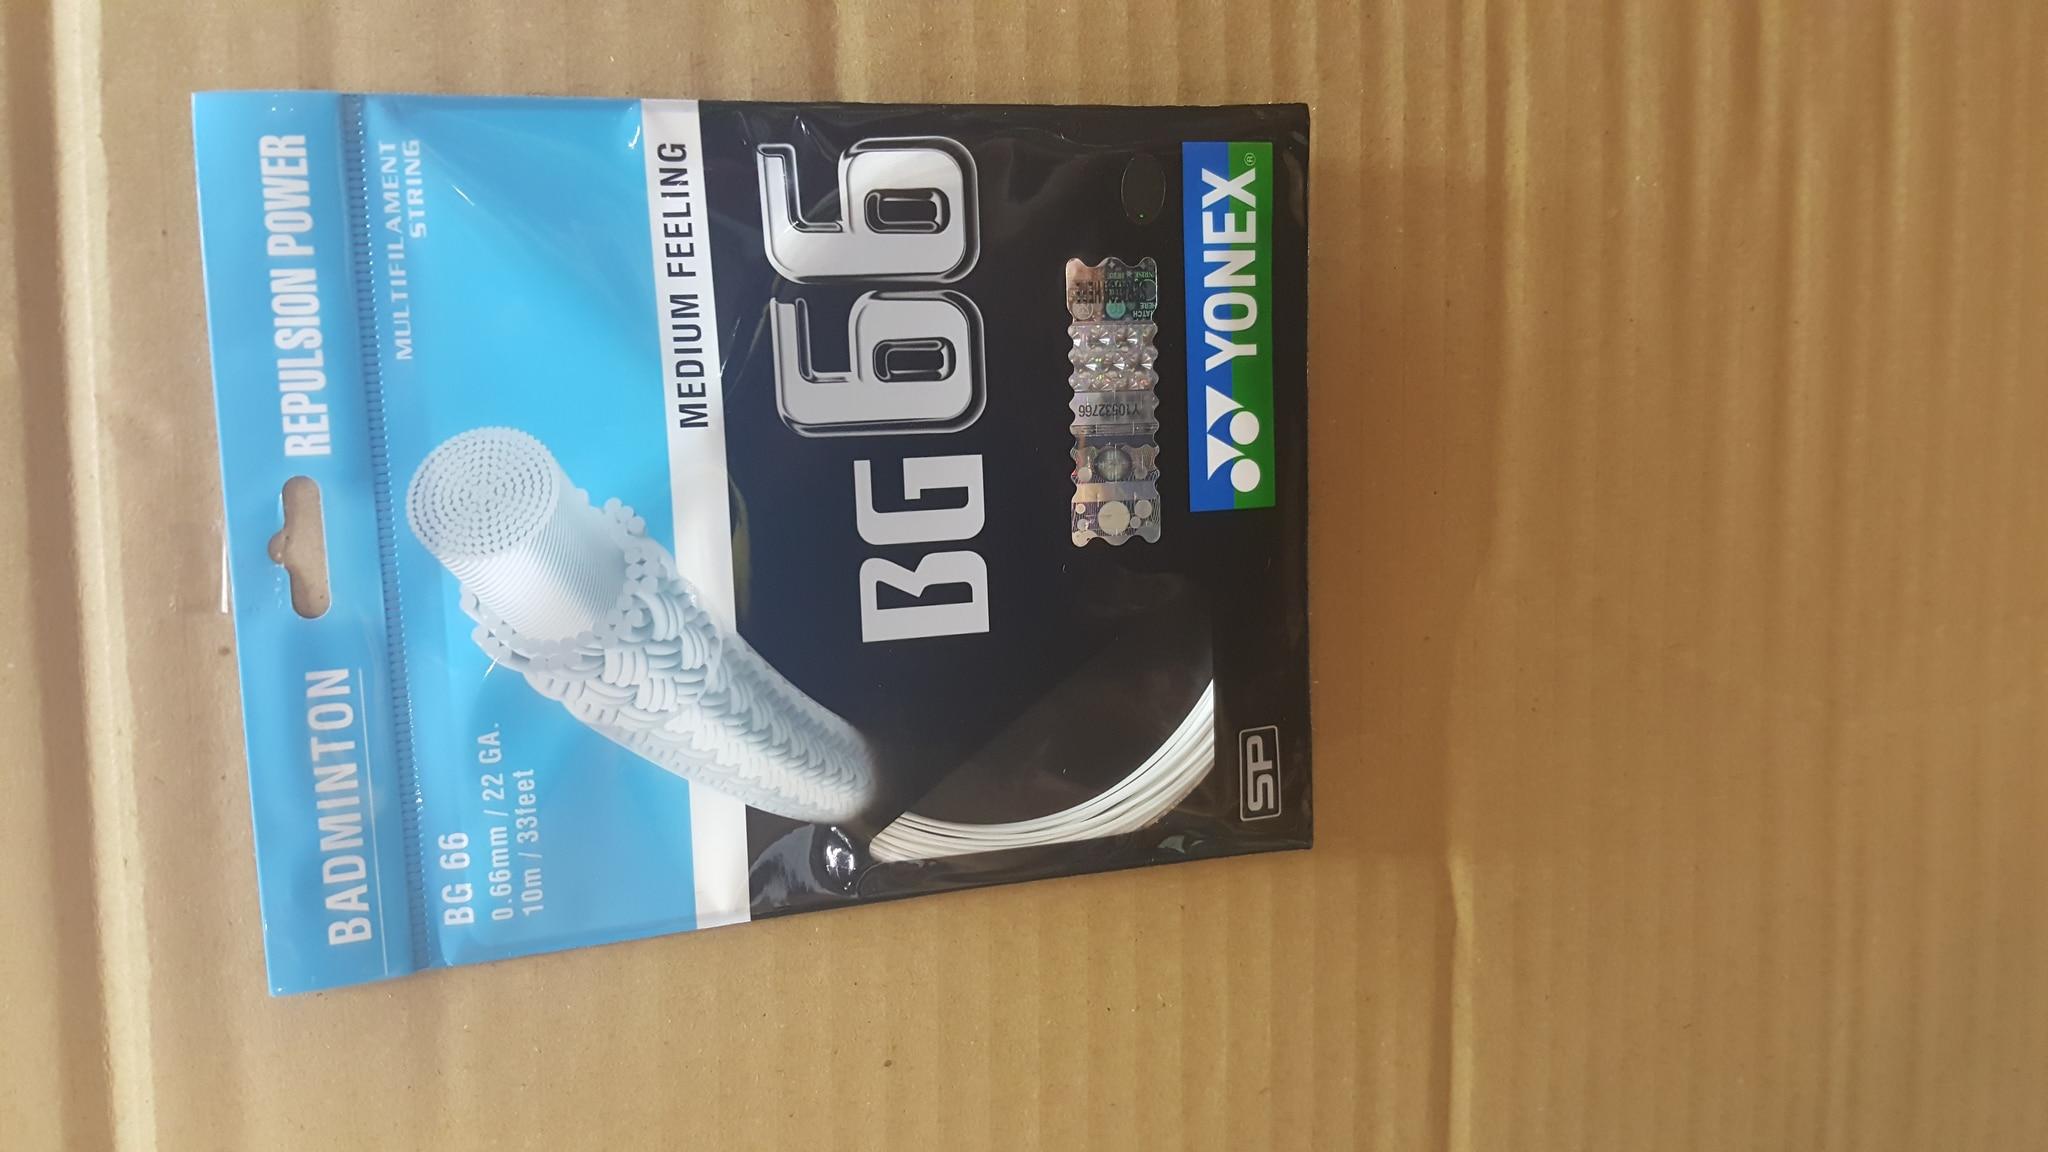 Yonex Bg 66 Sp Senar Raket Badminton Blue Unstrung New Best Buy Source · Senar raket